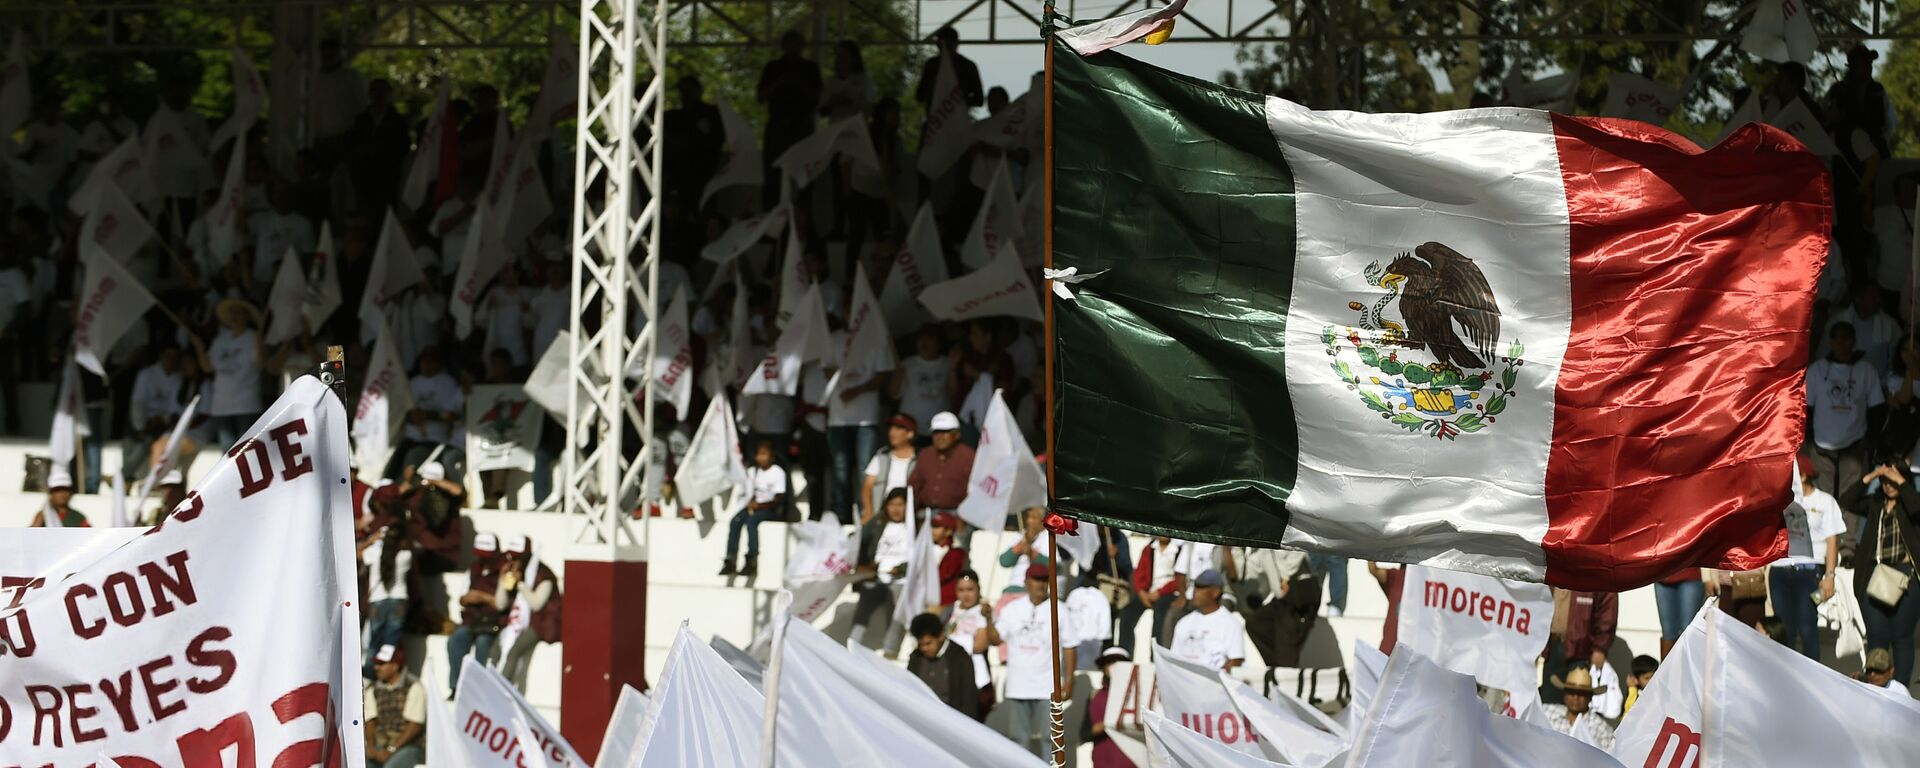 Banderas del partido gobernante mexicano Morena - Sputnik Mundo, 1920, 13.10.2020